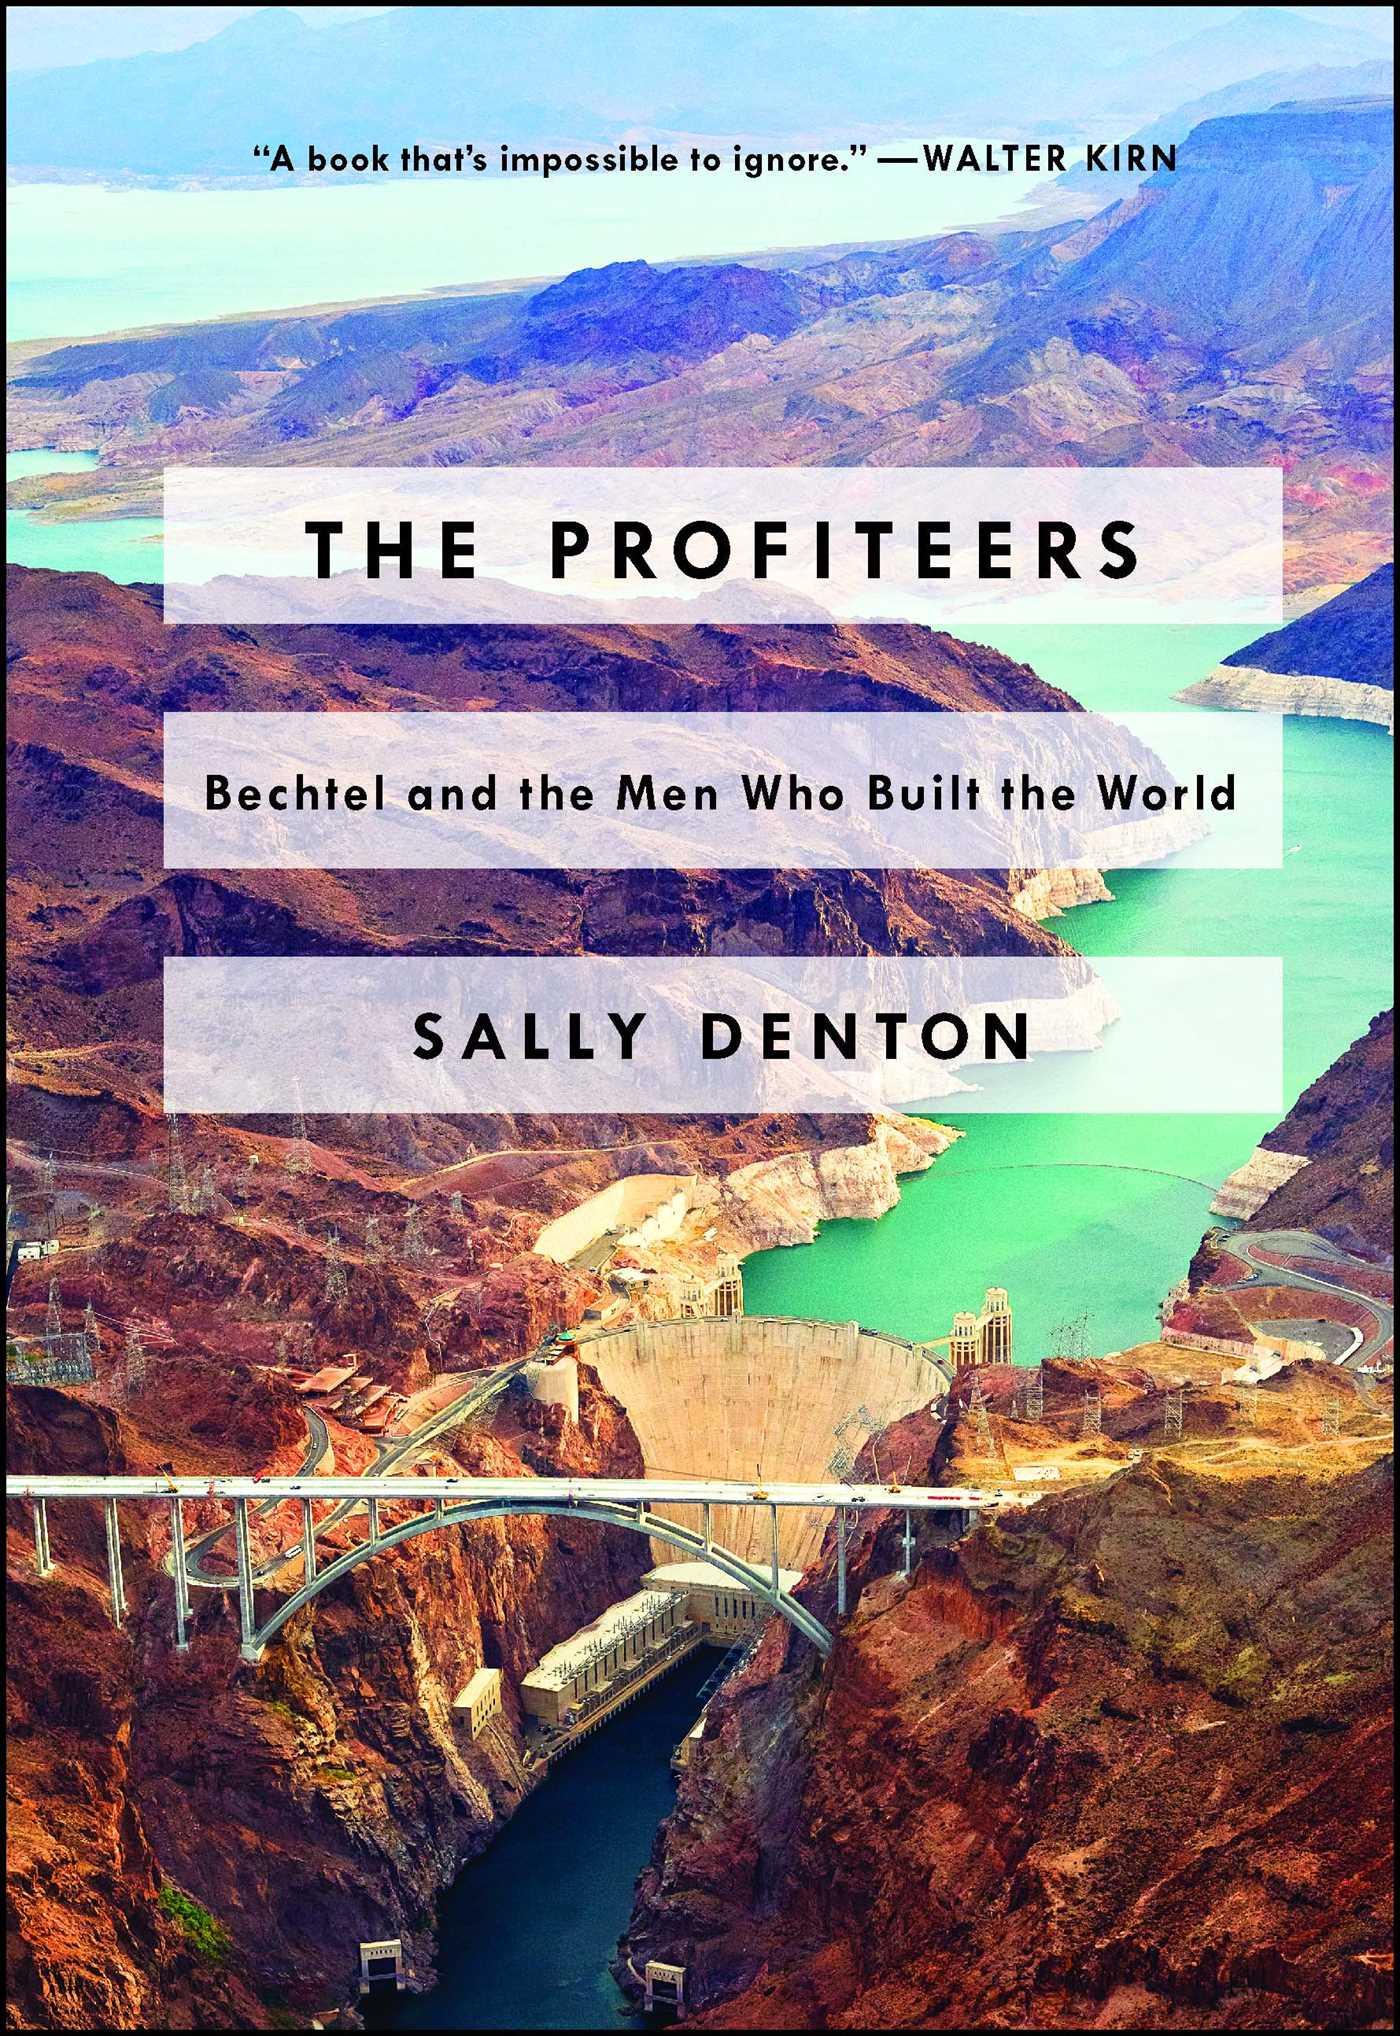 The profiteers 9781476706474 hr